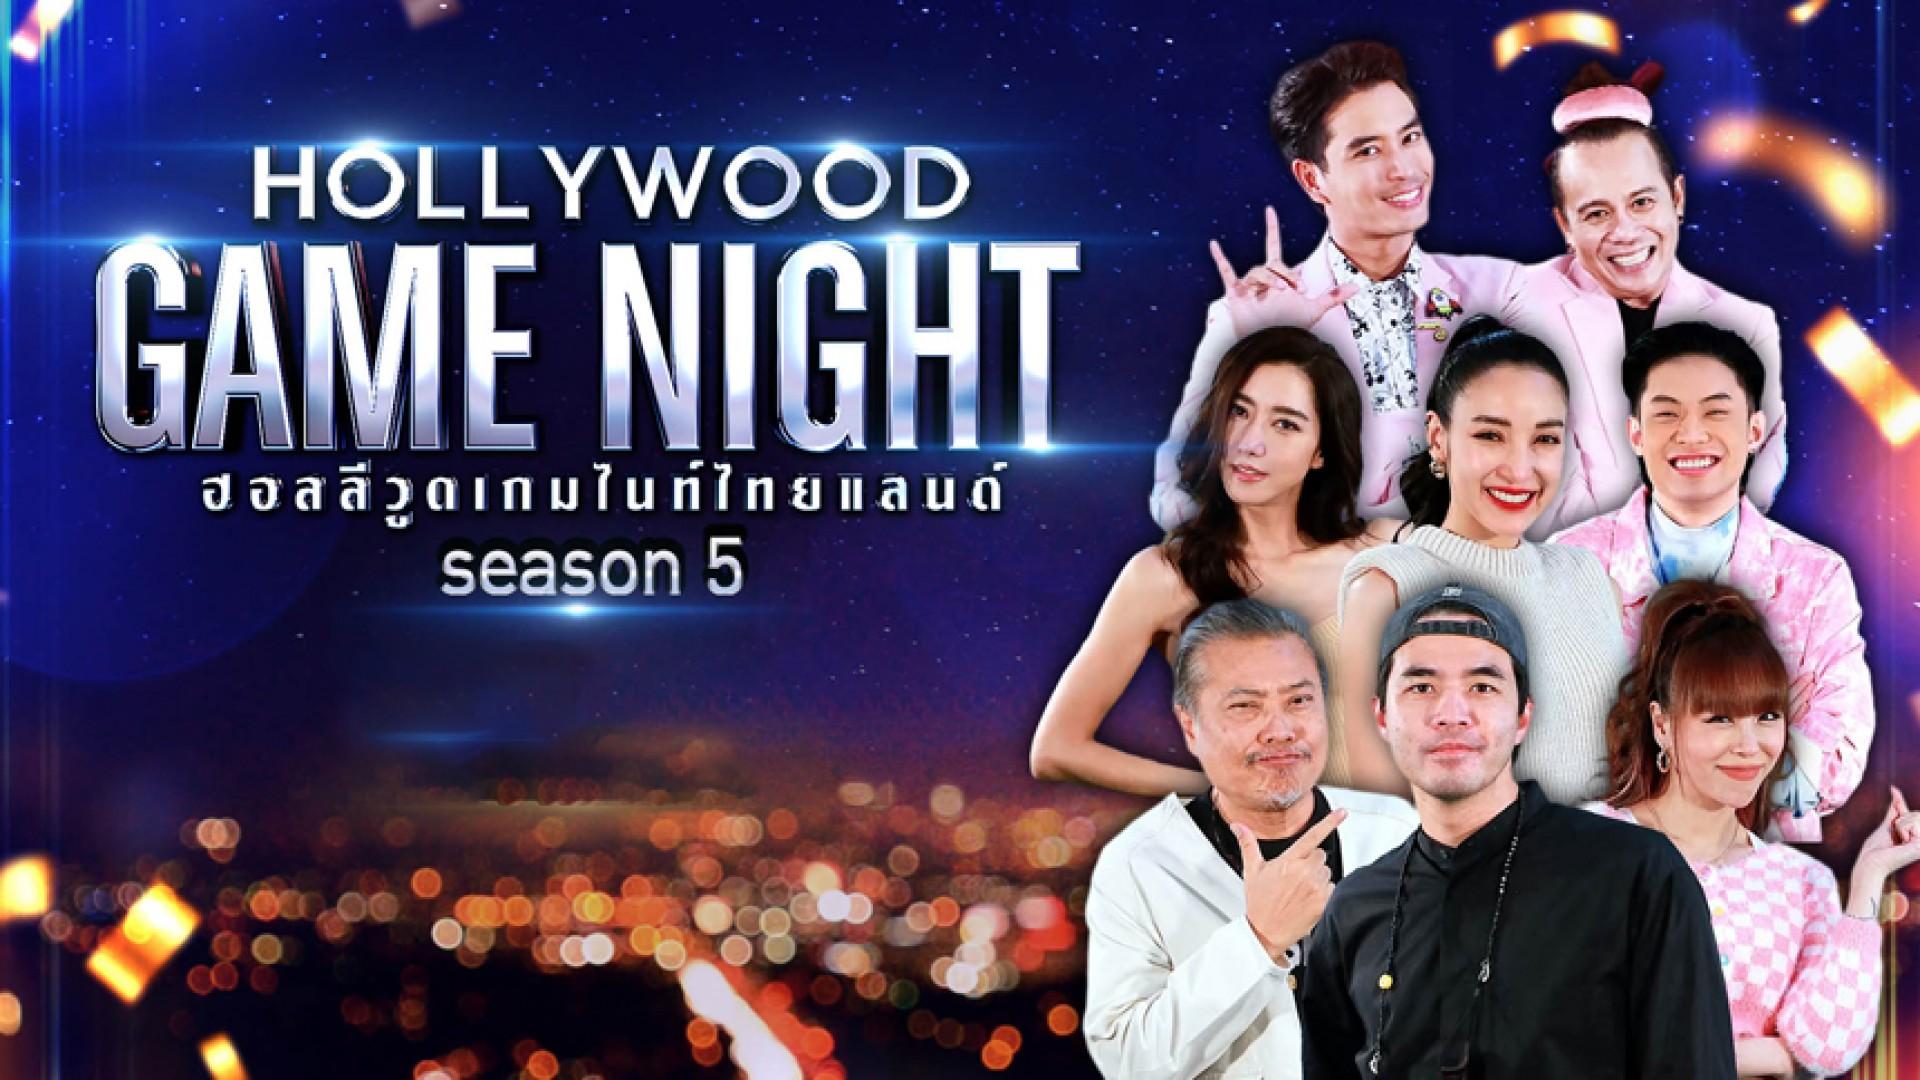 HOLLYWOOD GAME NIGHT THAILAND SEASON 5